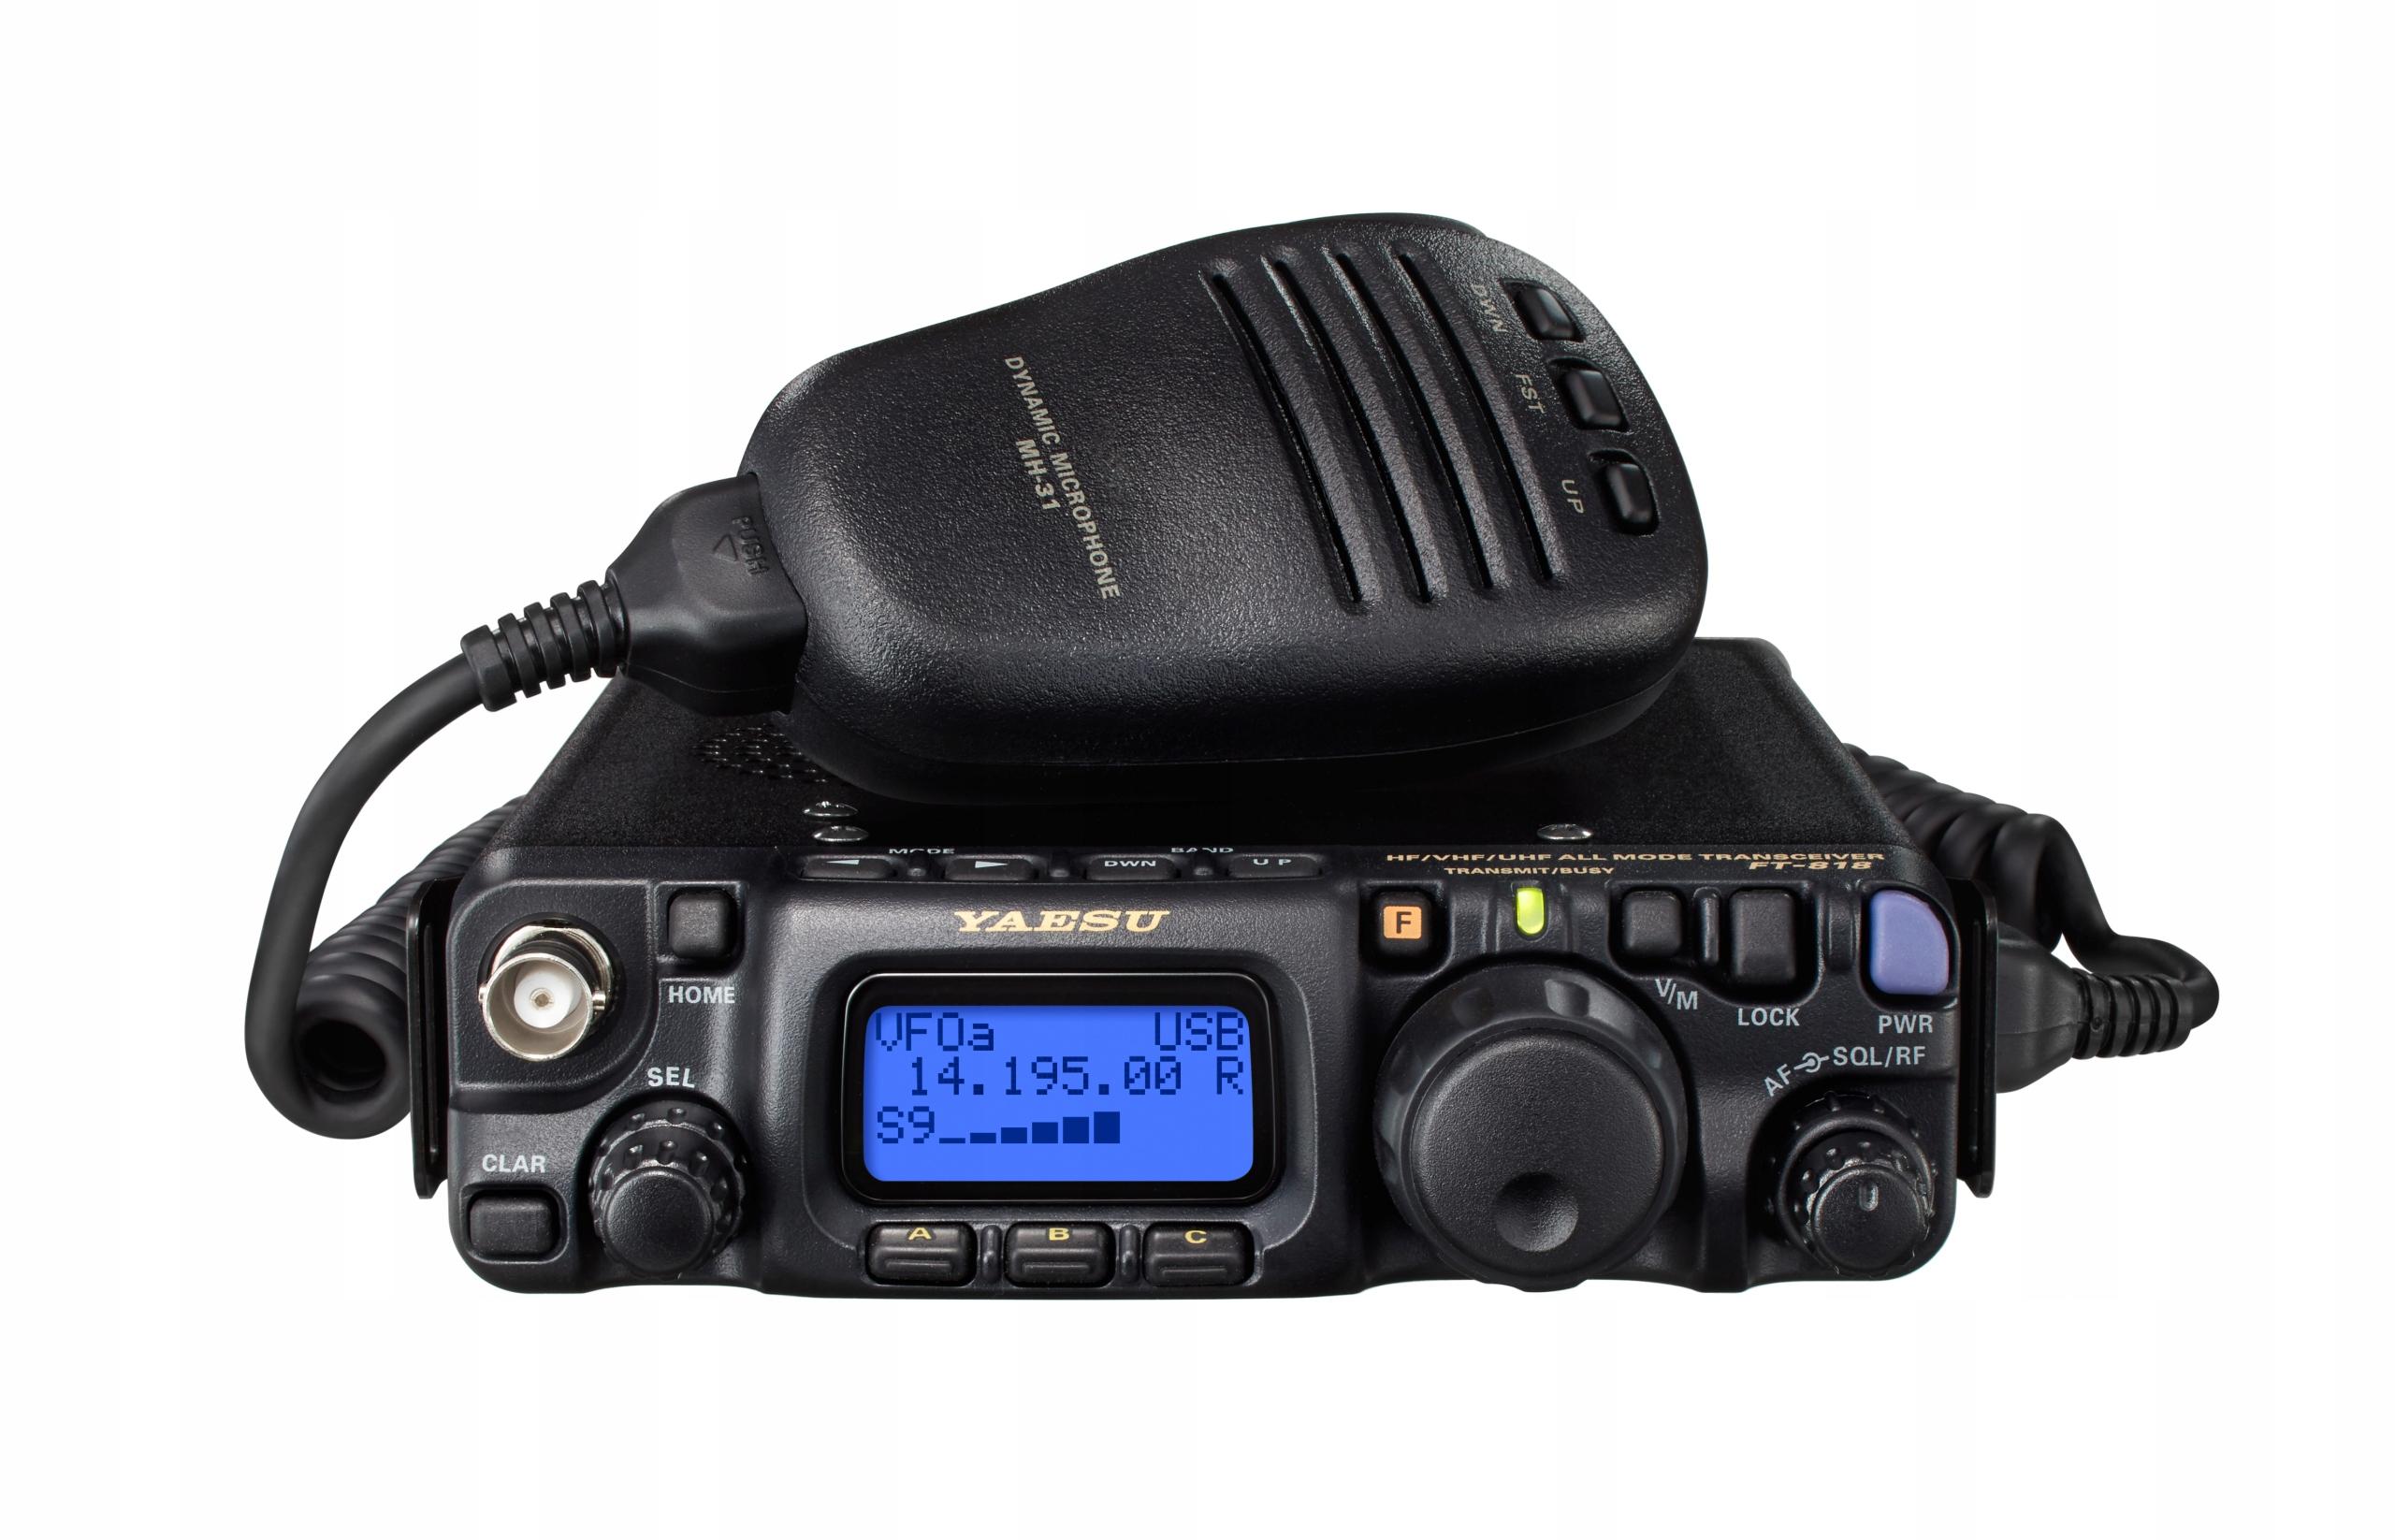 Item YAESU FT-818 Amateur radio QRP HF VHF UHF